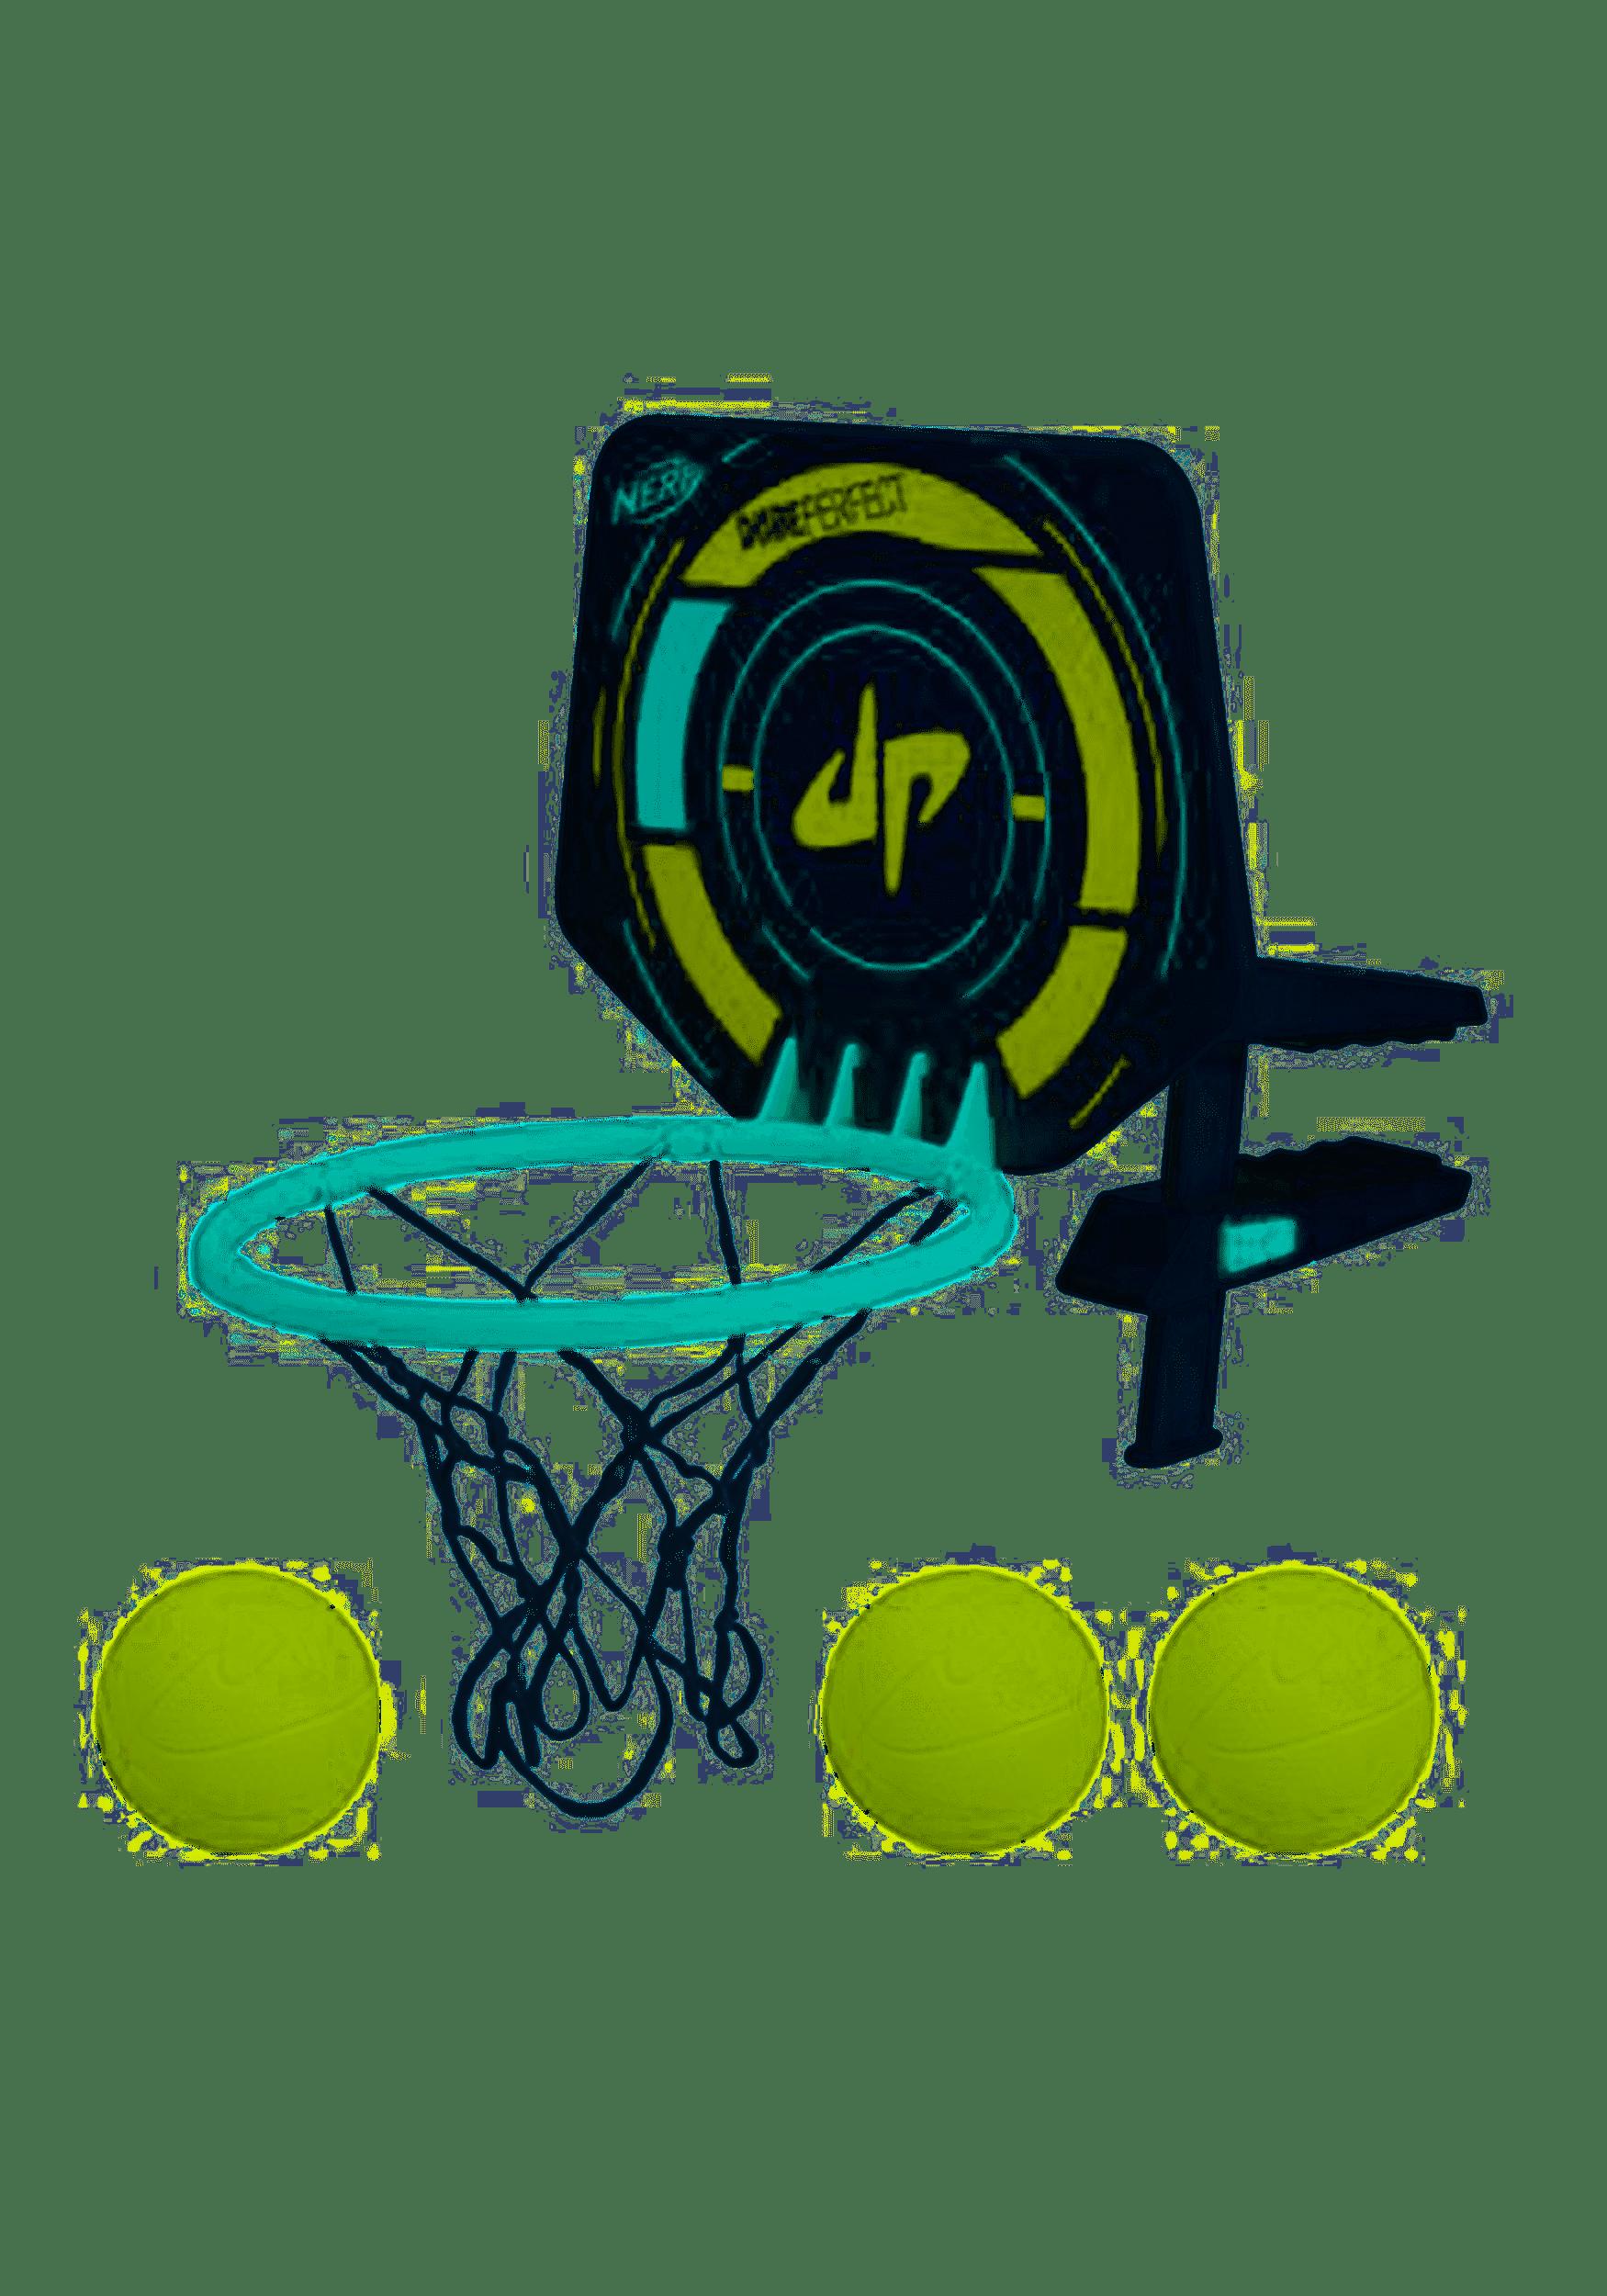 Nerf basket ball hoop - gift ideas for tween boys